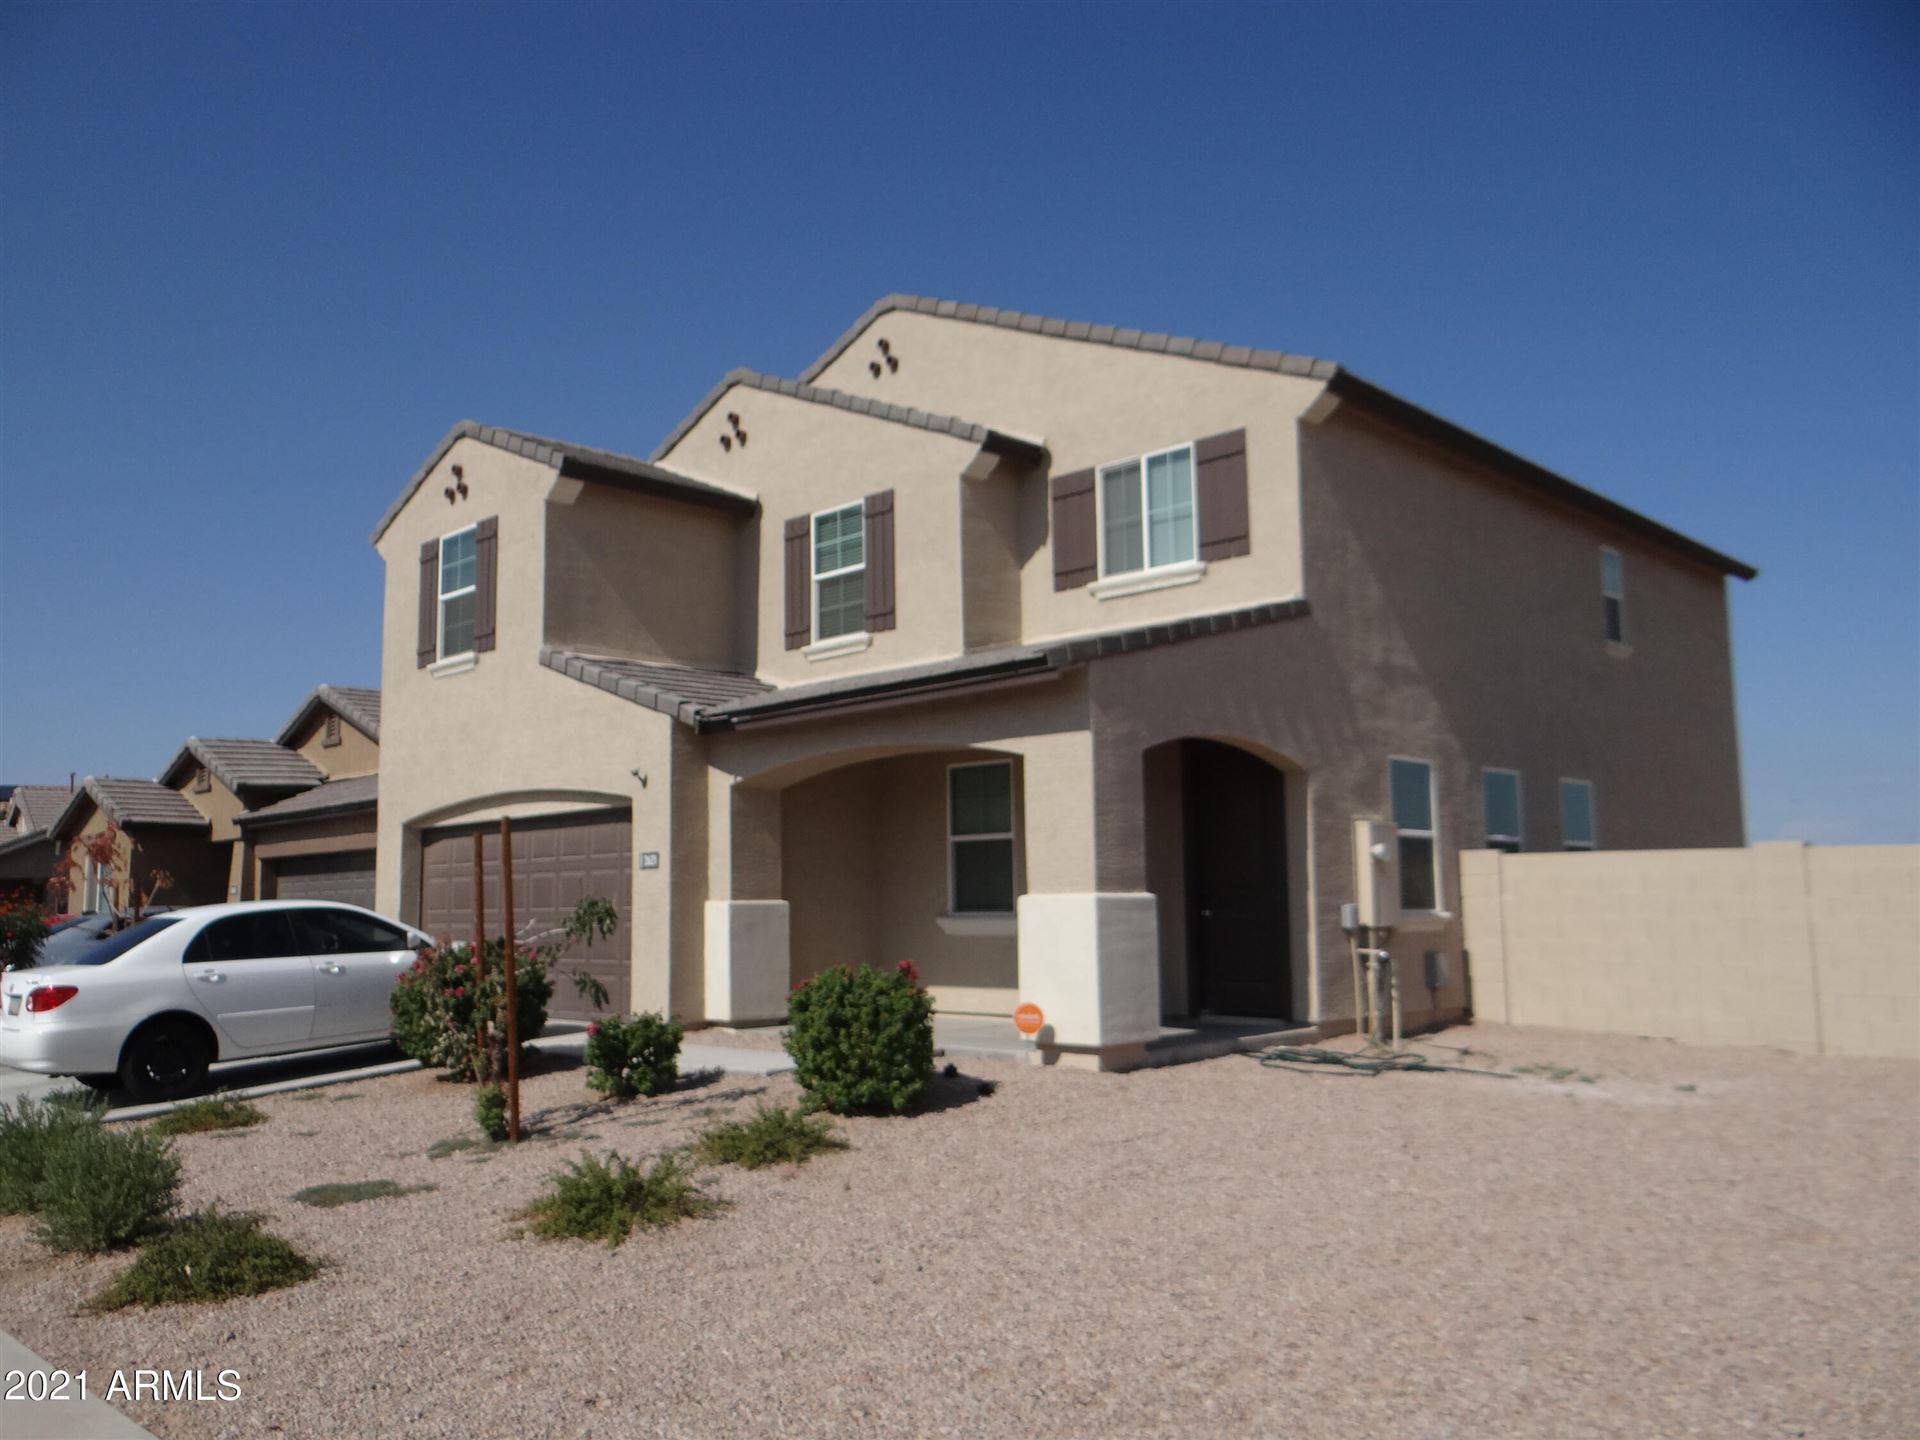 Photo of 2621 S 116TH Avenue, Avondale, AZ 85323 (MLS # 6266921)